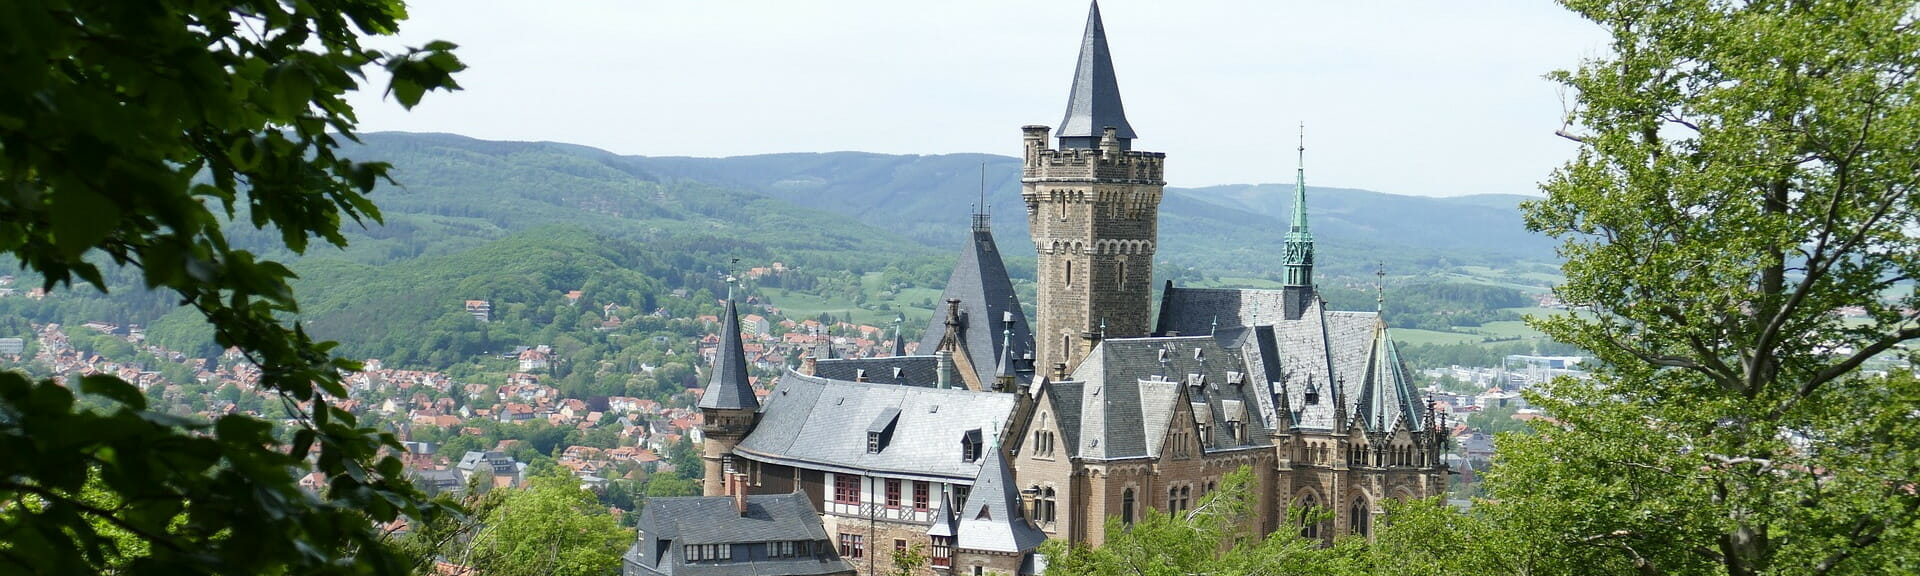 Klassenfahrt Harz Schloss Wernigerode